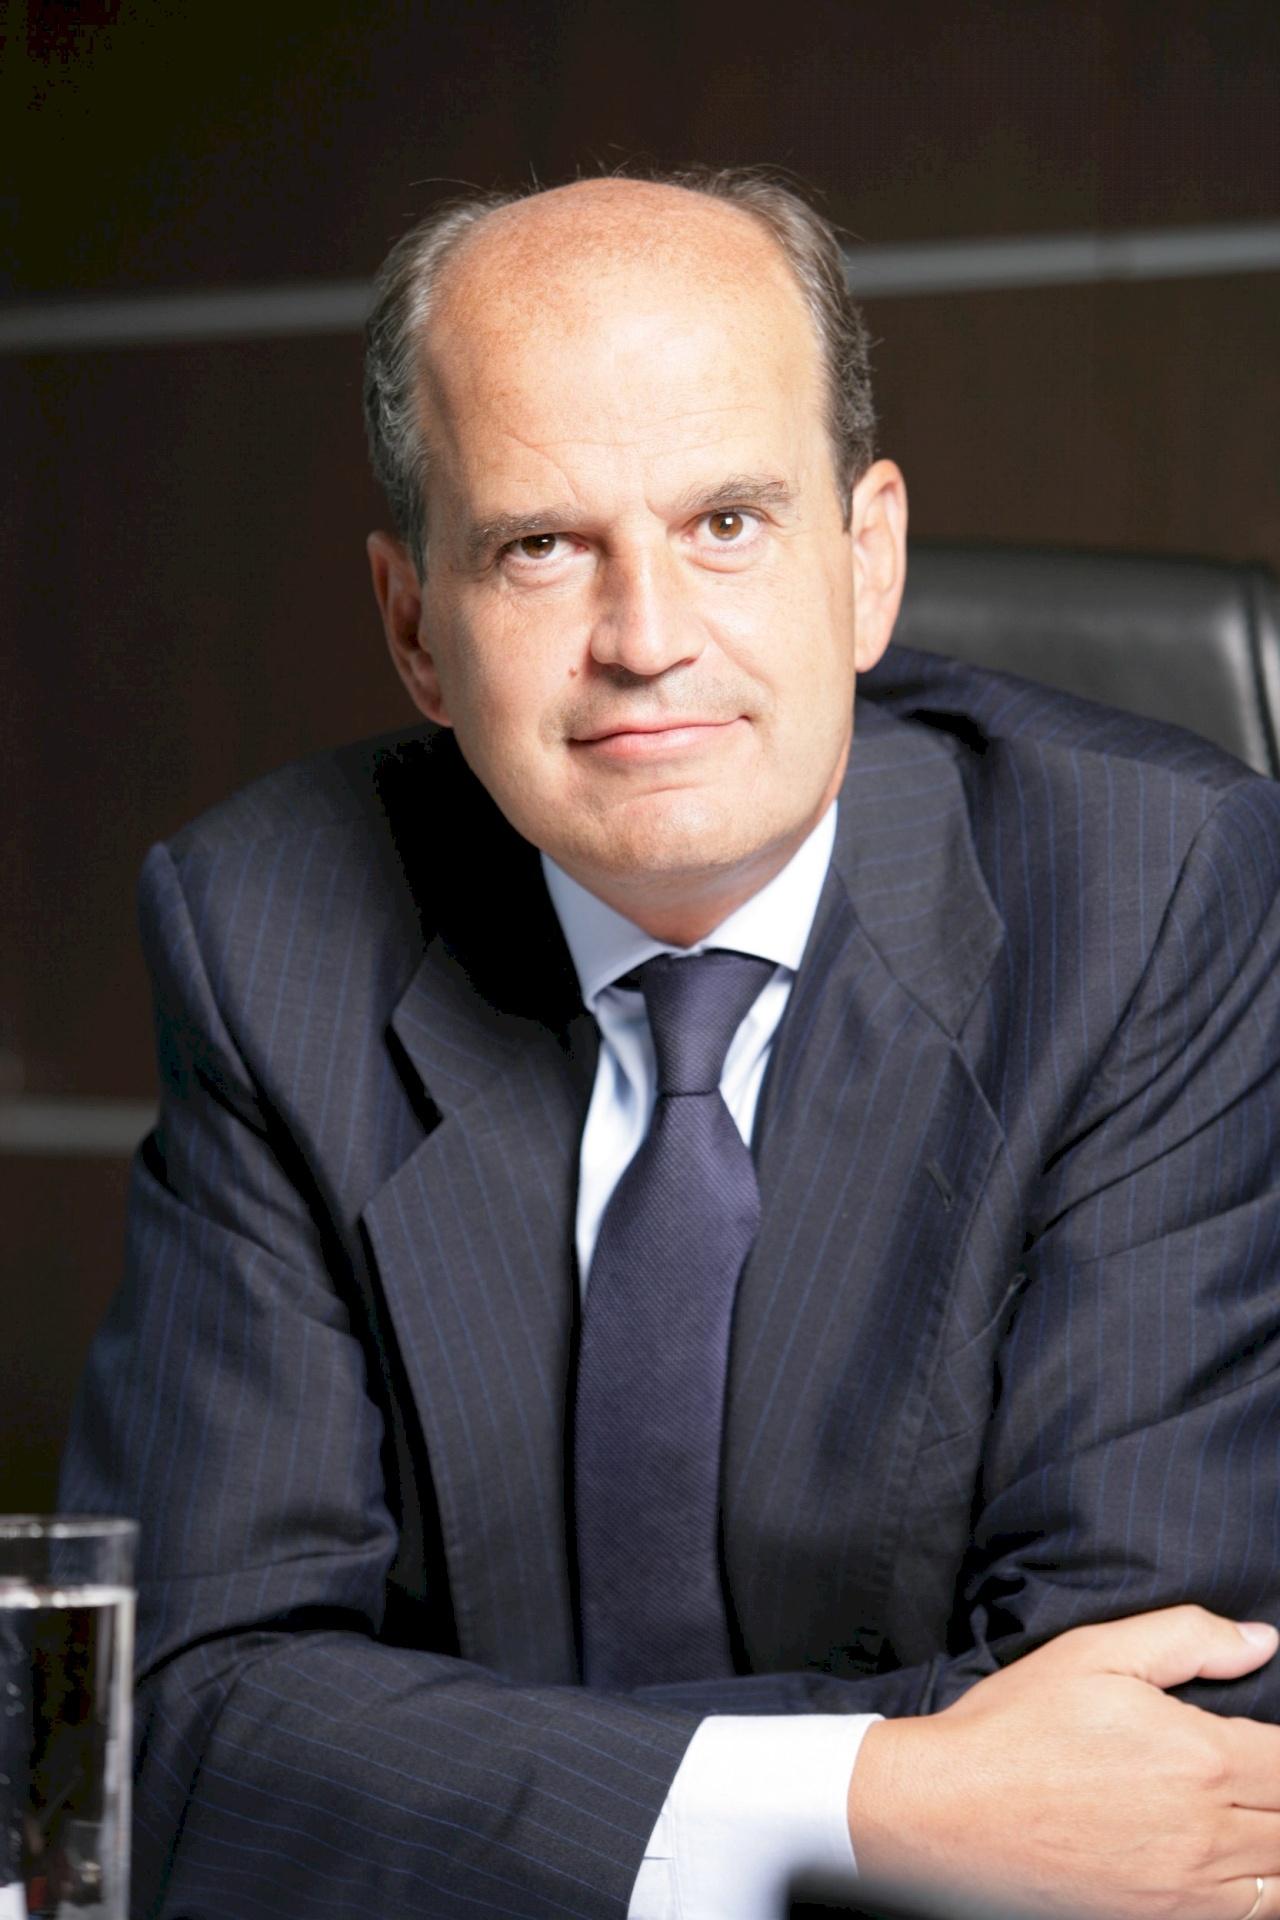 Ignacio Jaquotot